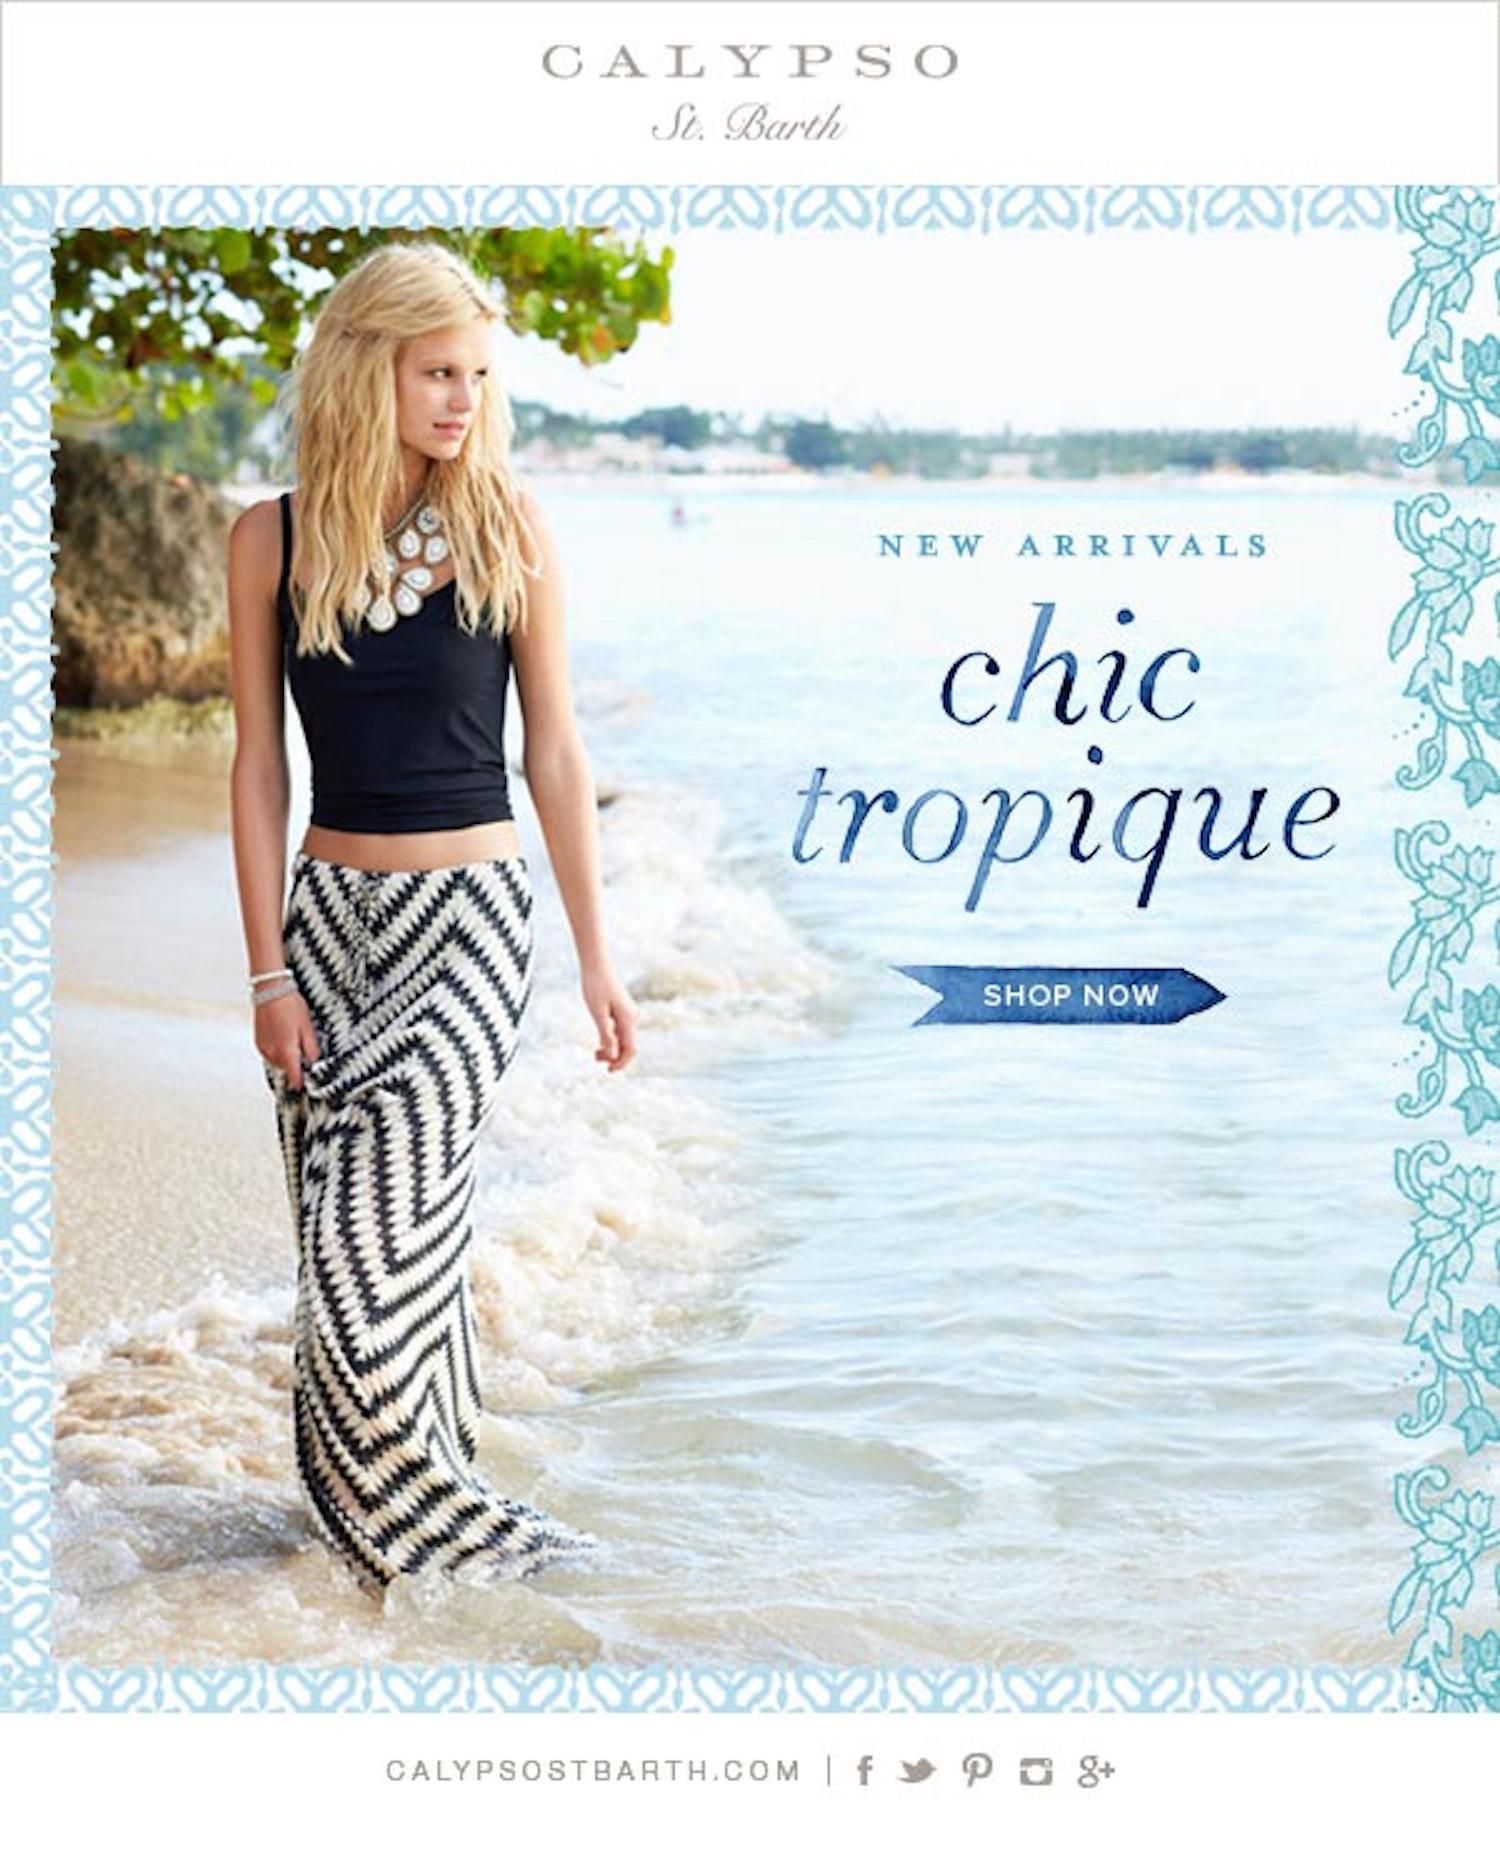 chic tropique calypso st barth in barbados with nadine leopold and matt jones